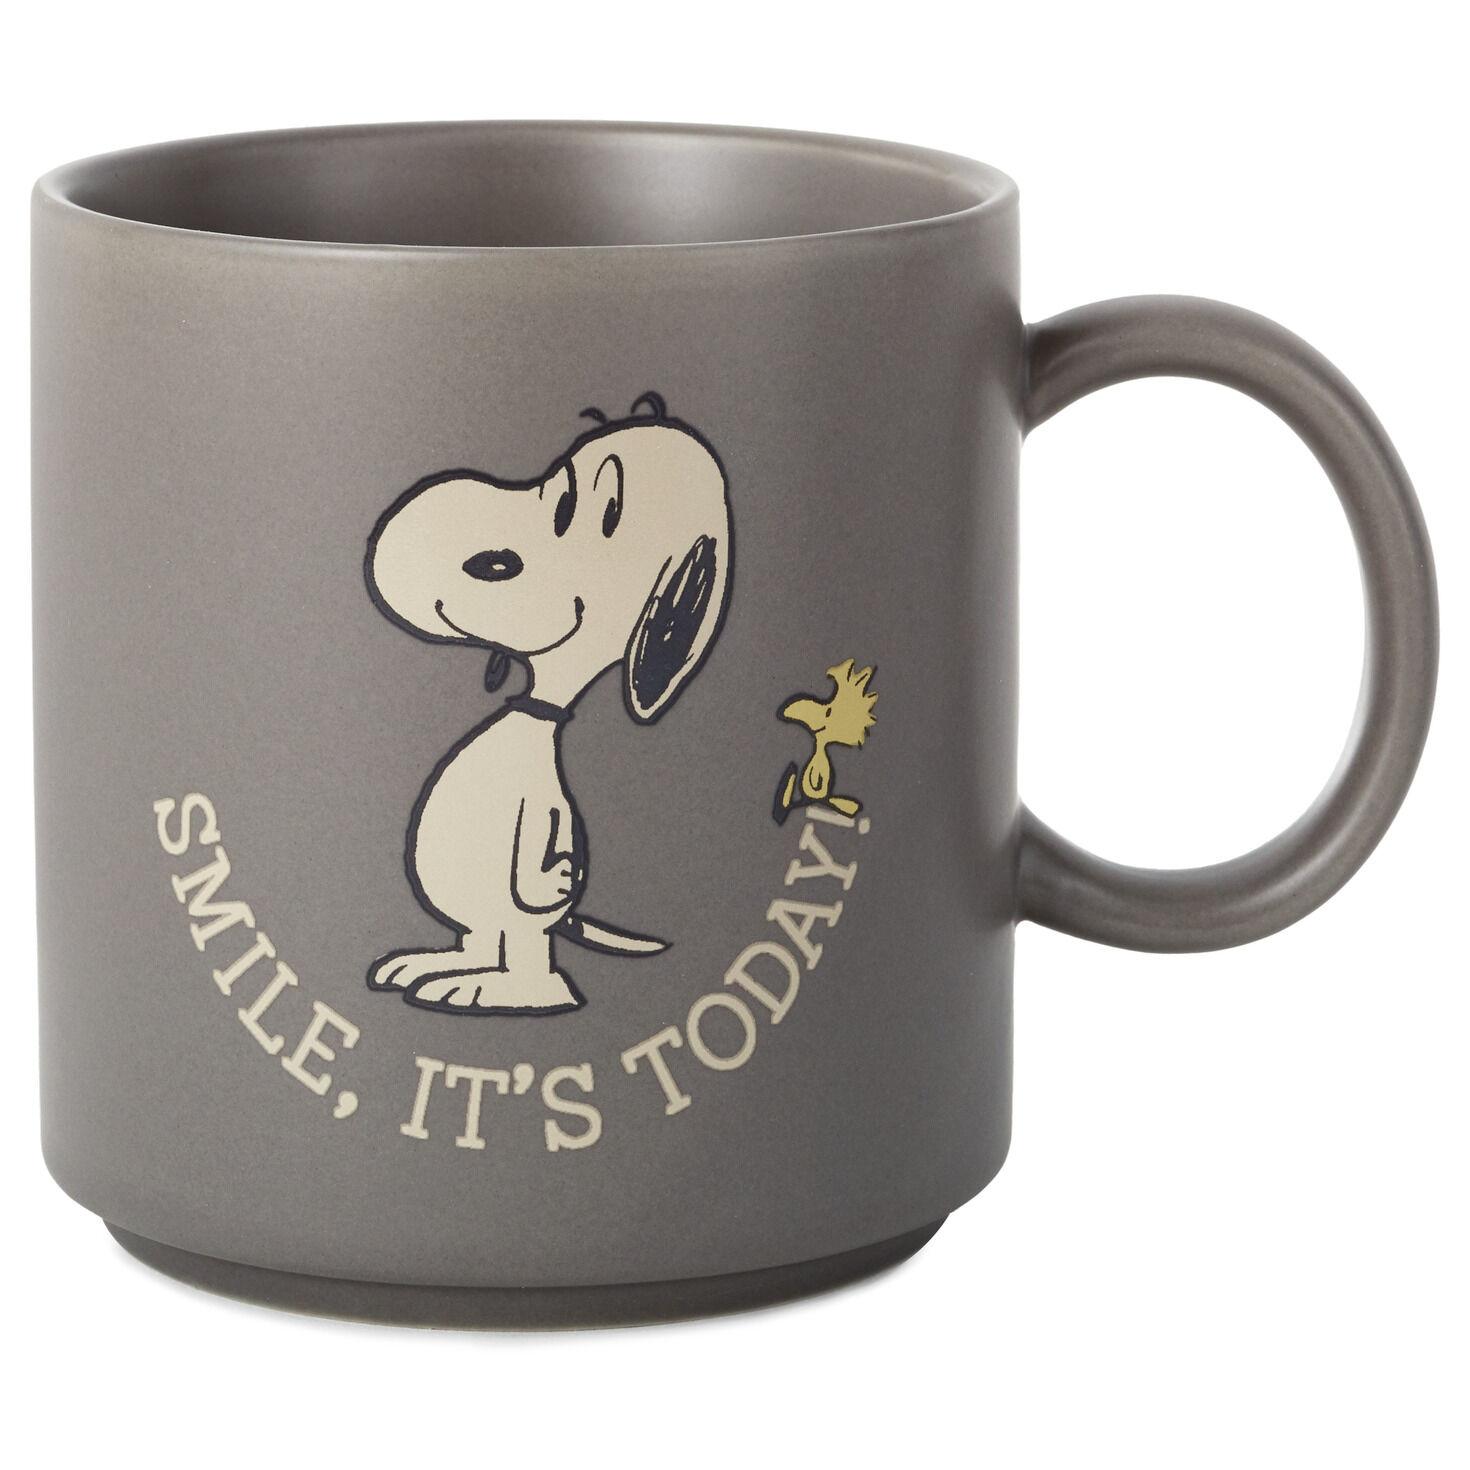 Funny Coffee Mug Tea Cup Inspirational Quote For Men Women Kids Xmas Gift Idea White Fine